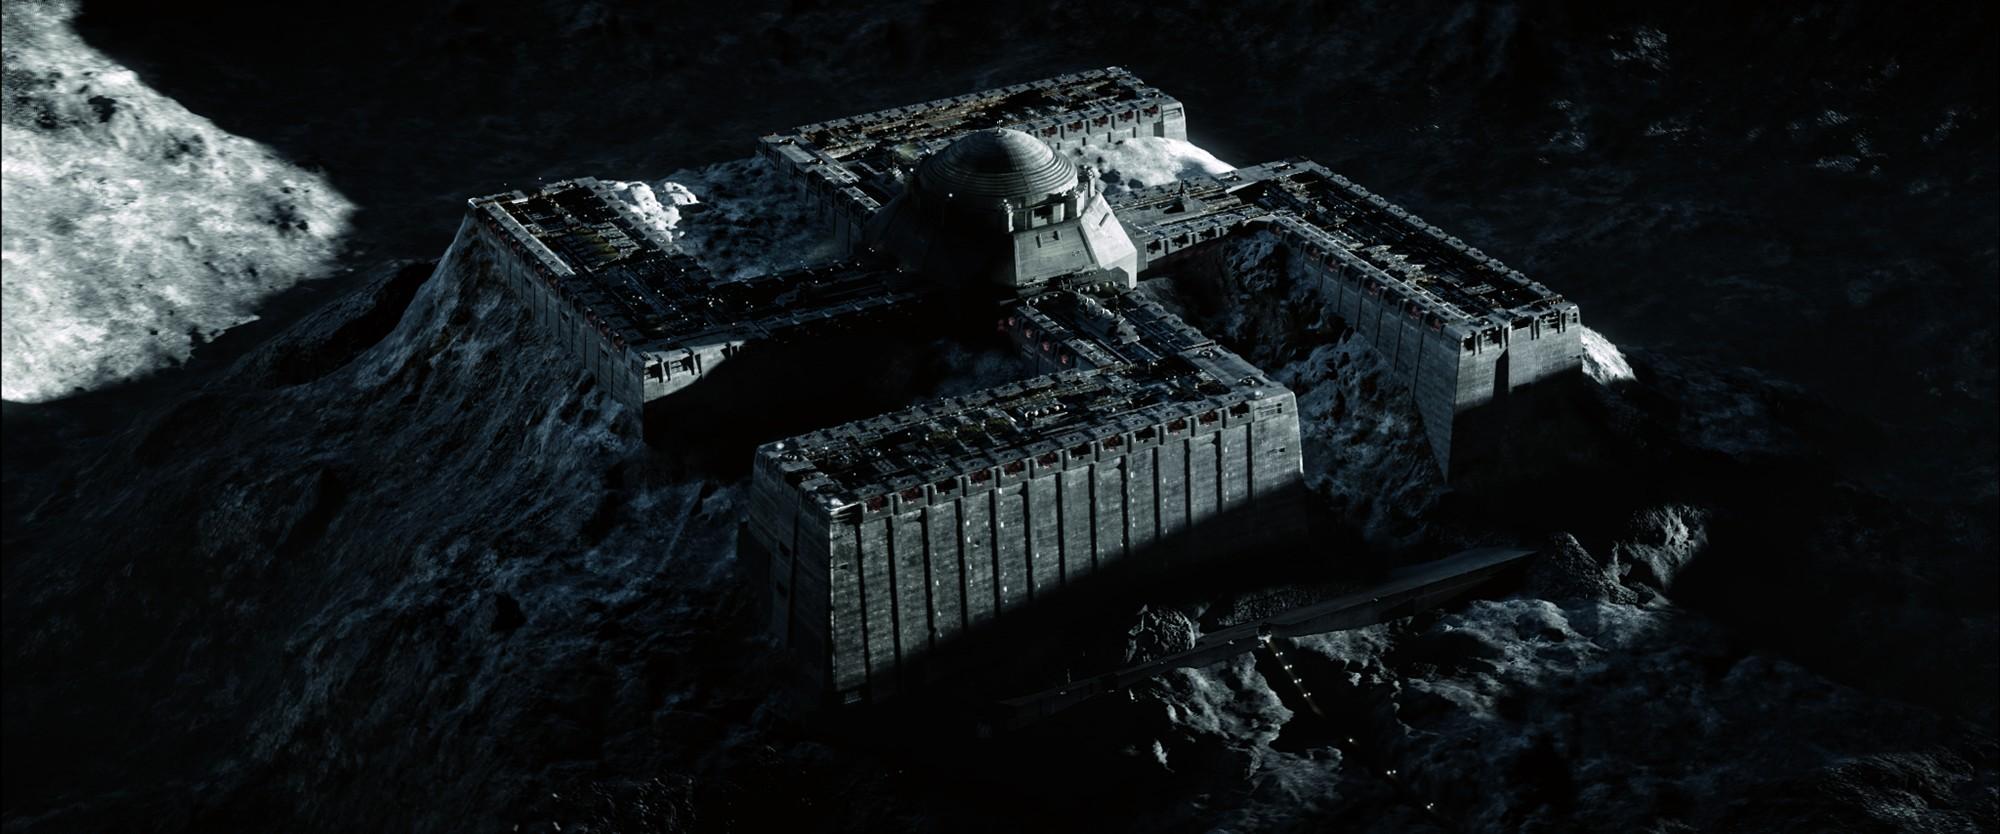 nazi moon base zombies - photo #42